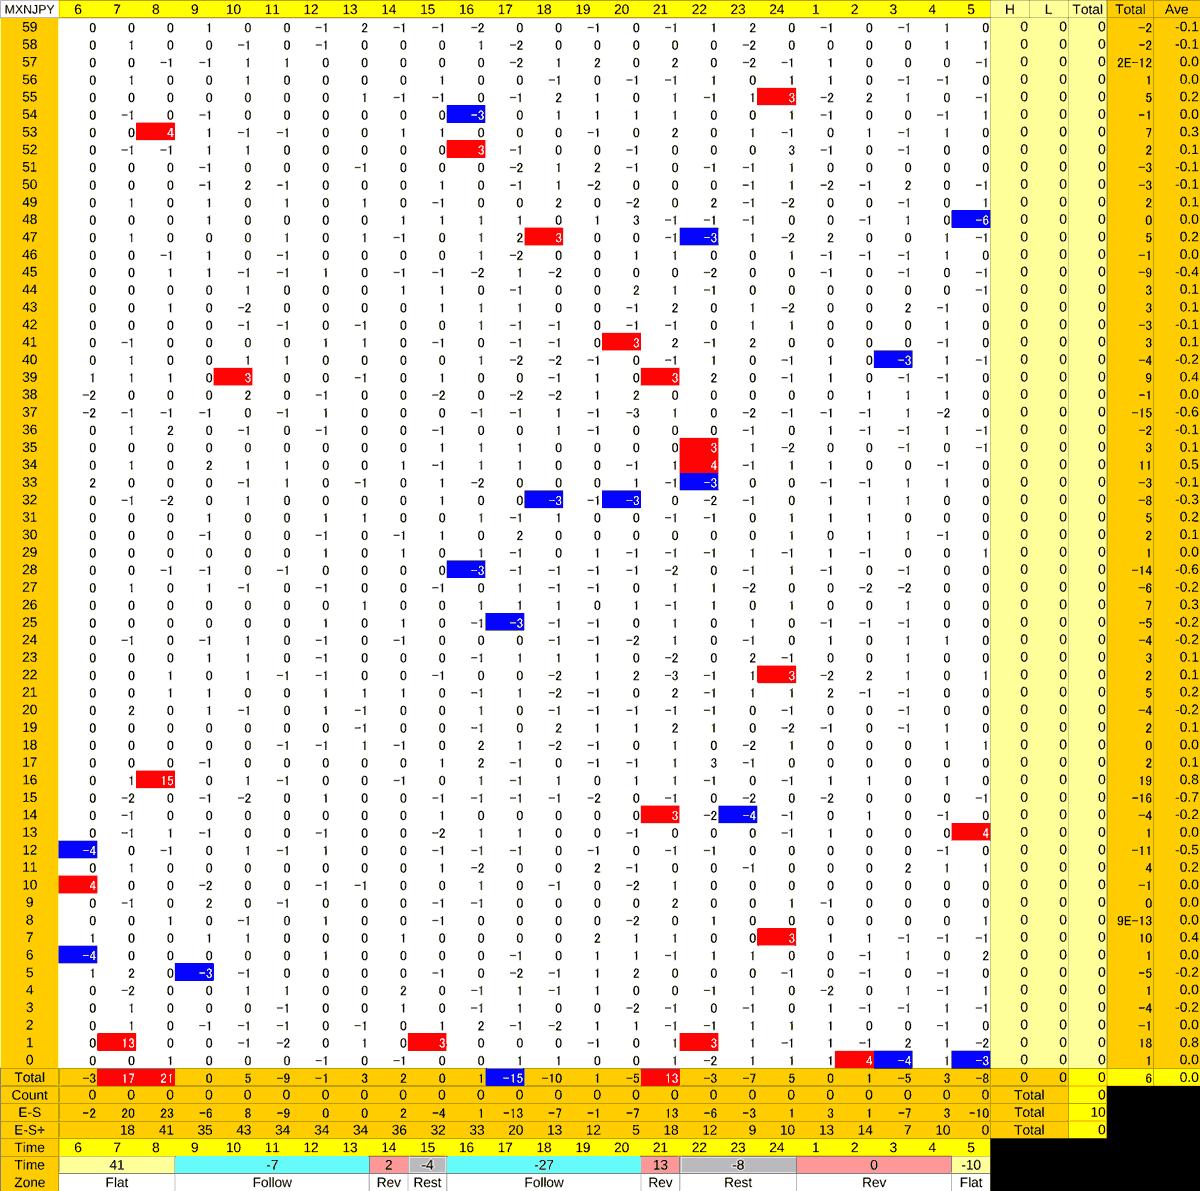 20201012_HS(3)MXNJPY